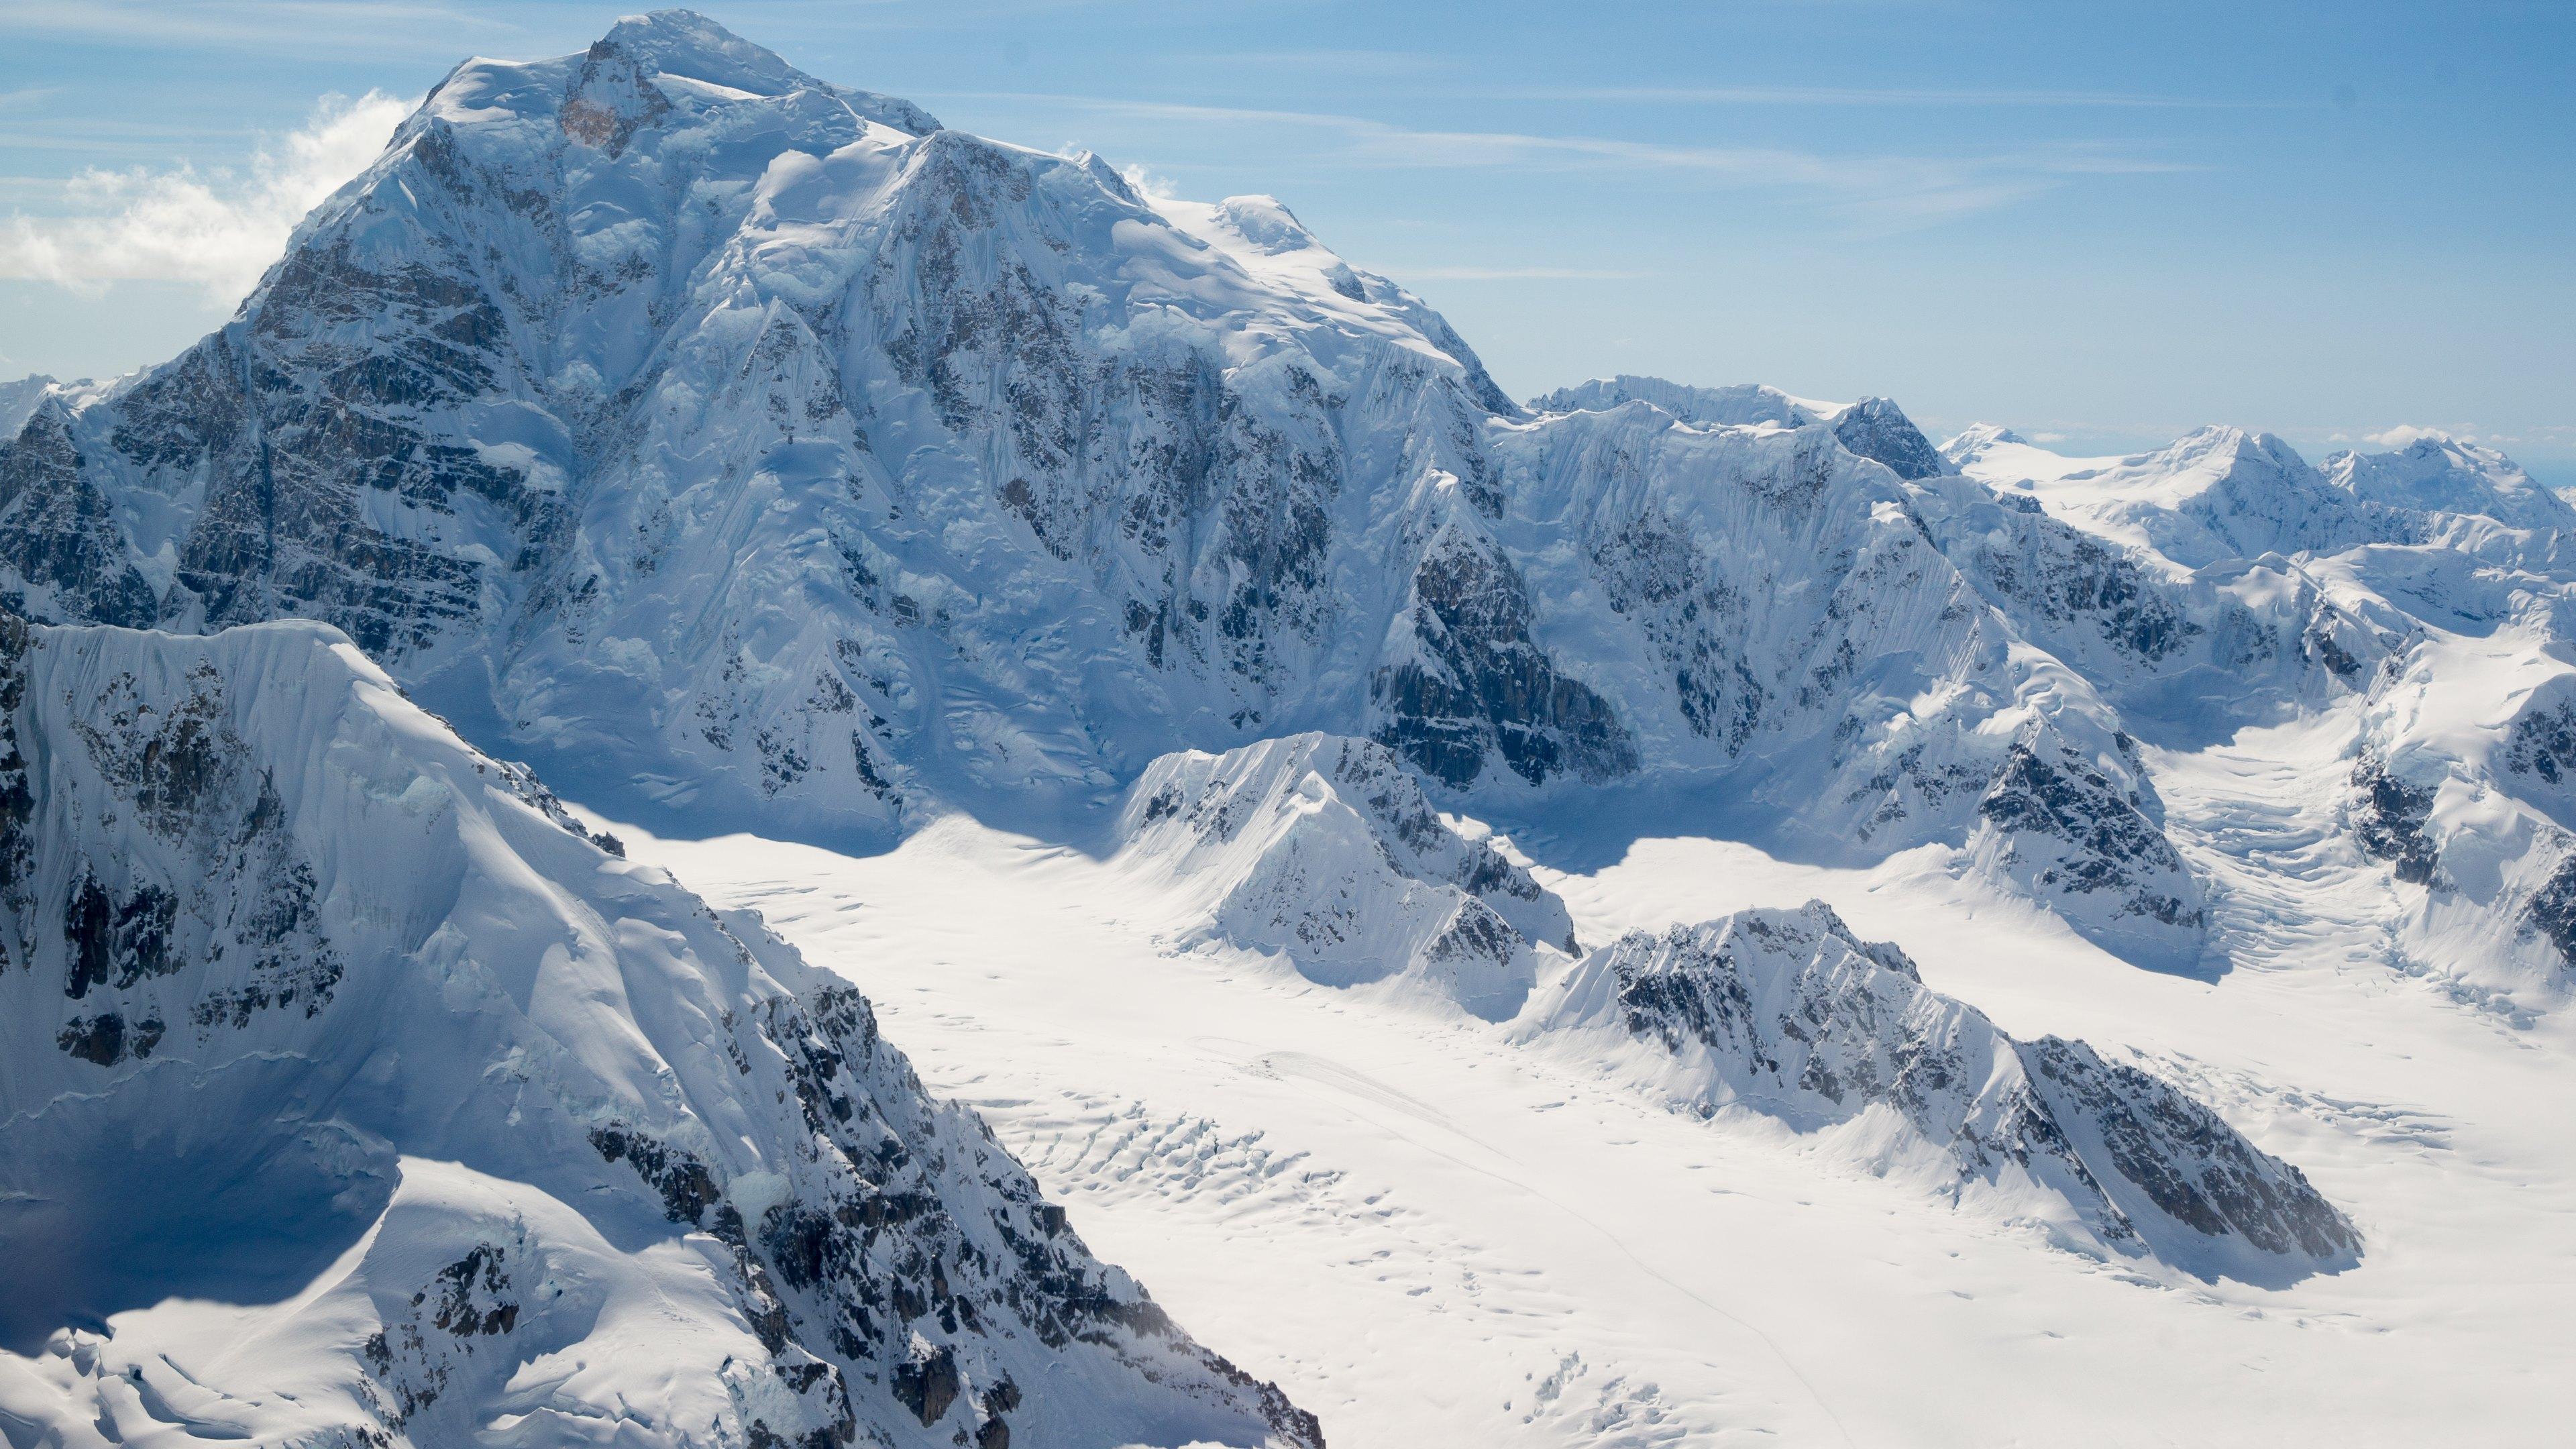 Quotes Hindi Wallpaper Download Earth Mountain Alaska Peak Snow Winter Wallpaper